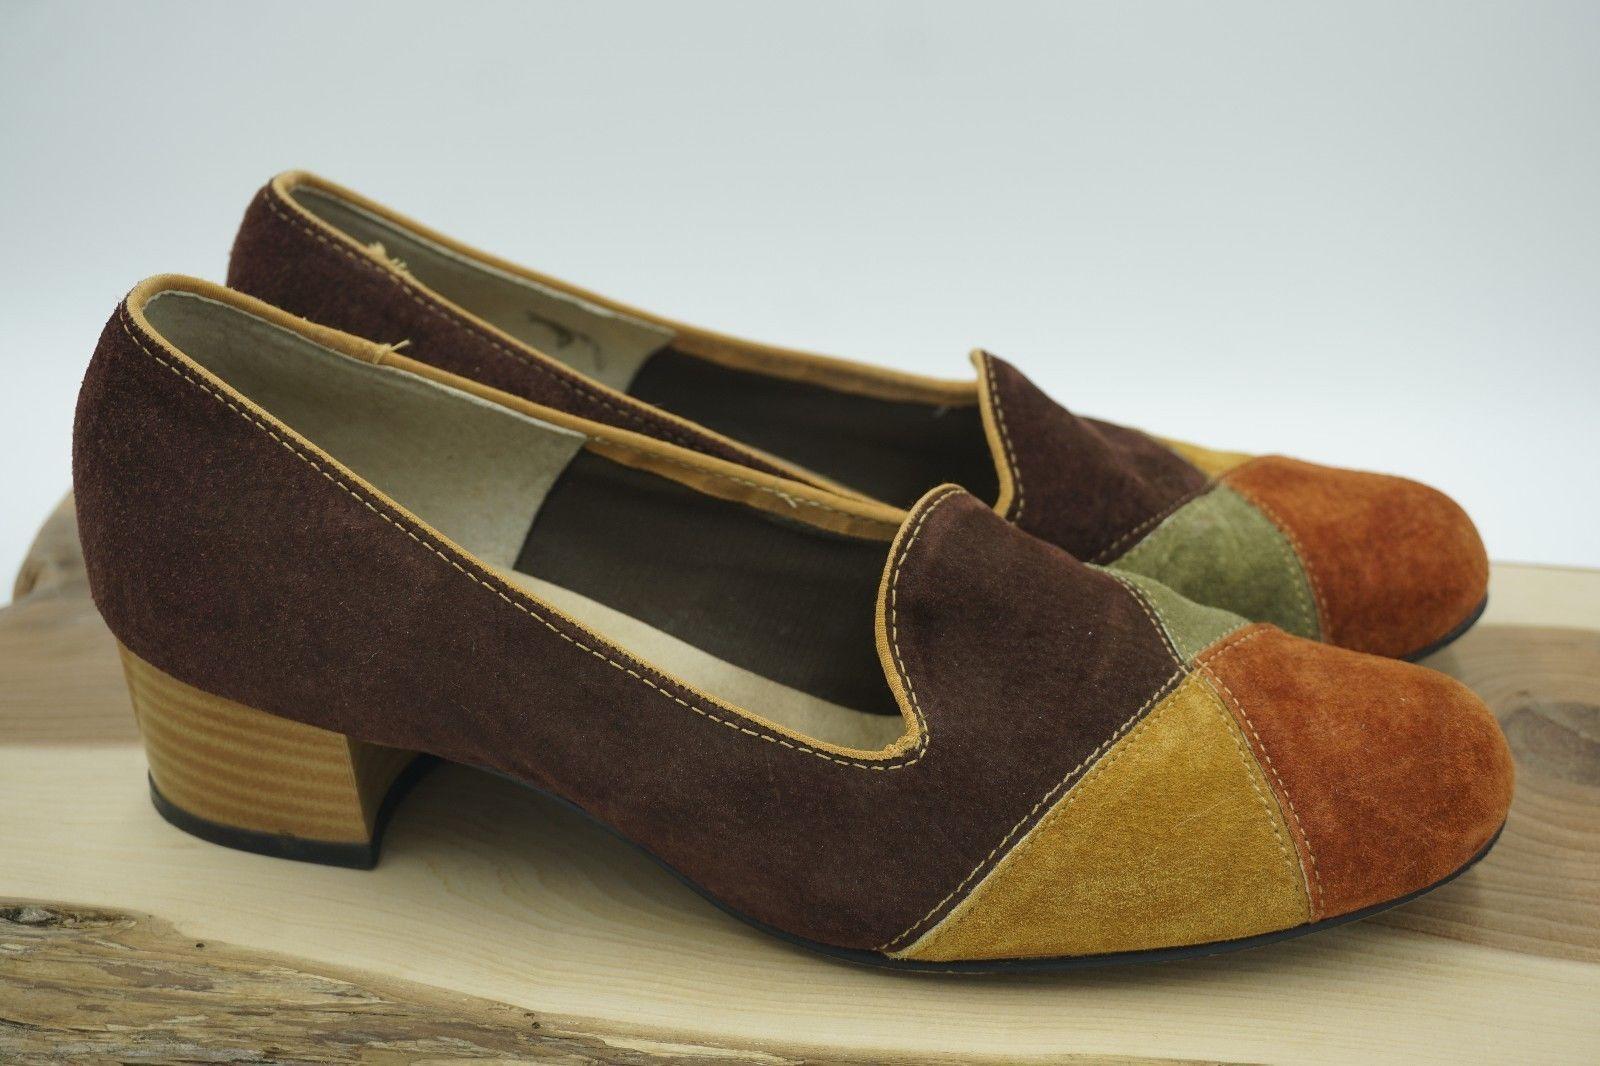 Vintage Hush Puppies Women S Suede Heels Shoes Size 10 70s Mod